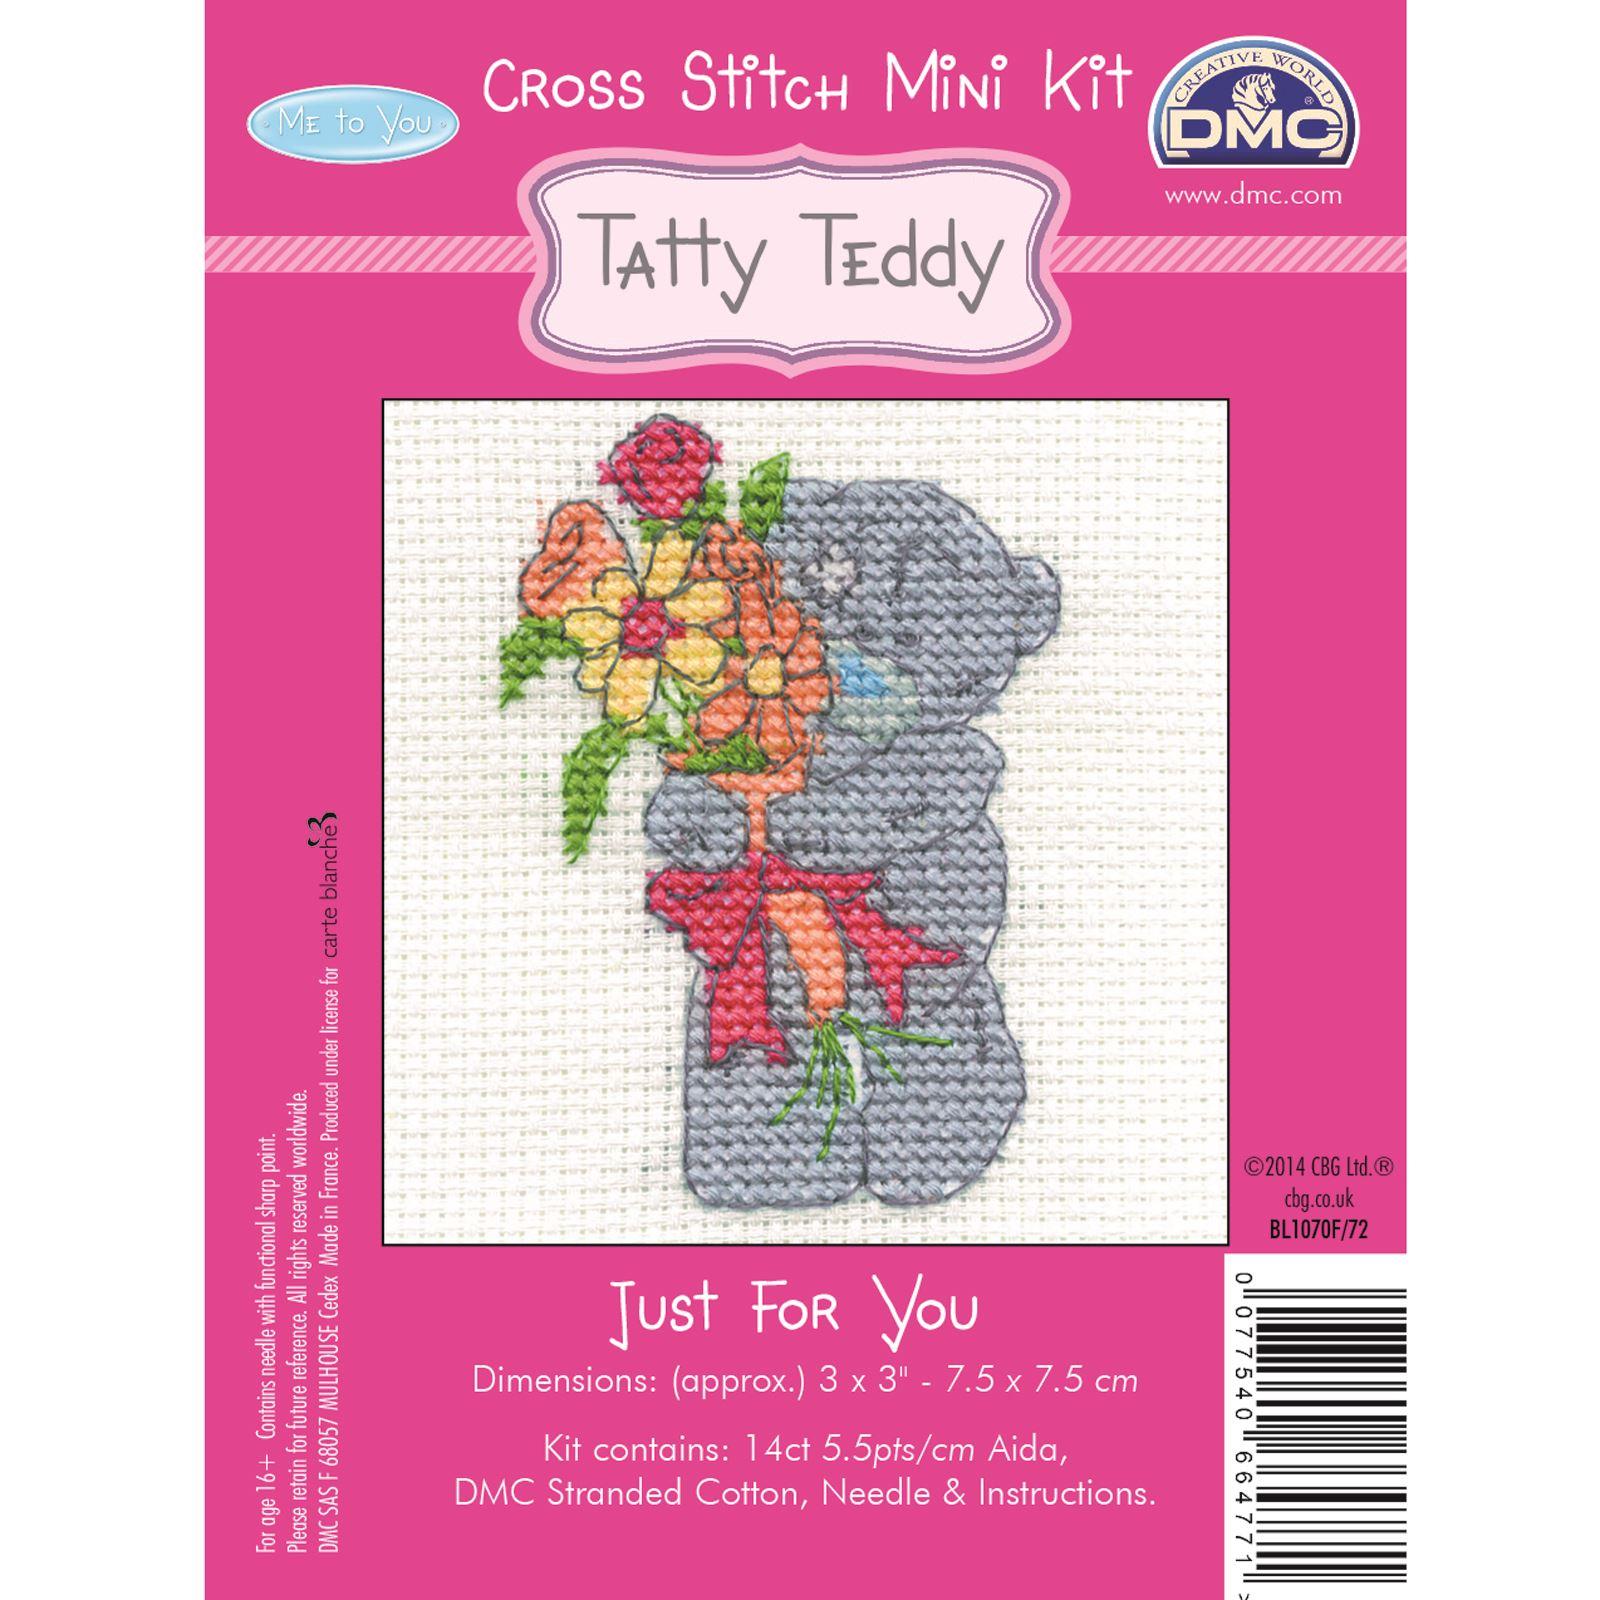 DMC-Mini-Cross-Stitch-Kit-Me-to-You-Tatty-Teddy-8-Designs thumbnail 9